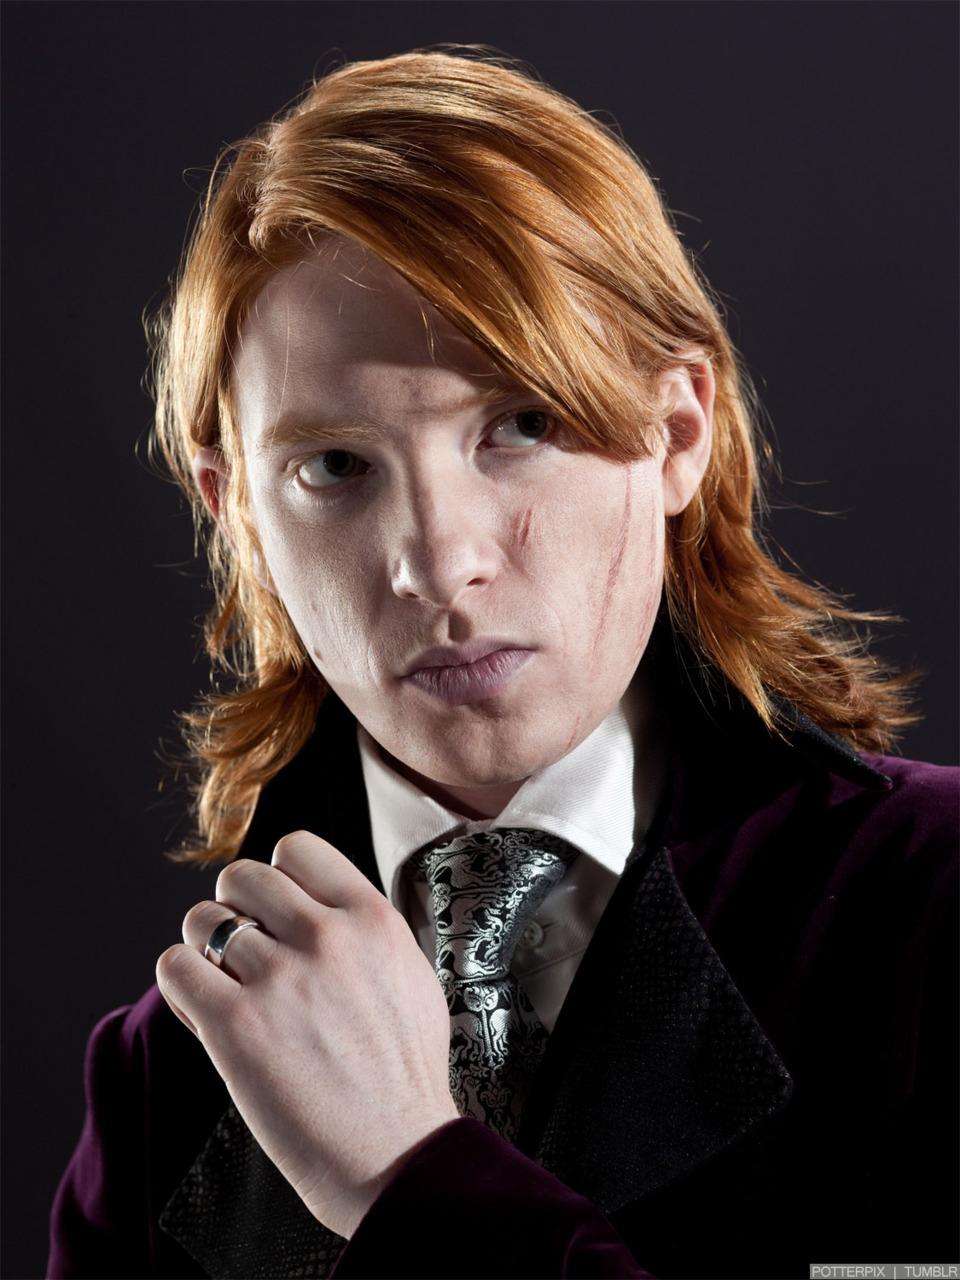 Bill Weasley (Wolf Among Us)